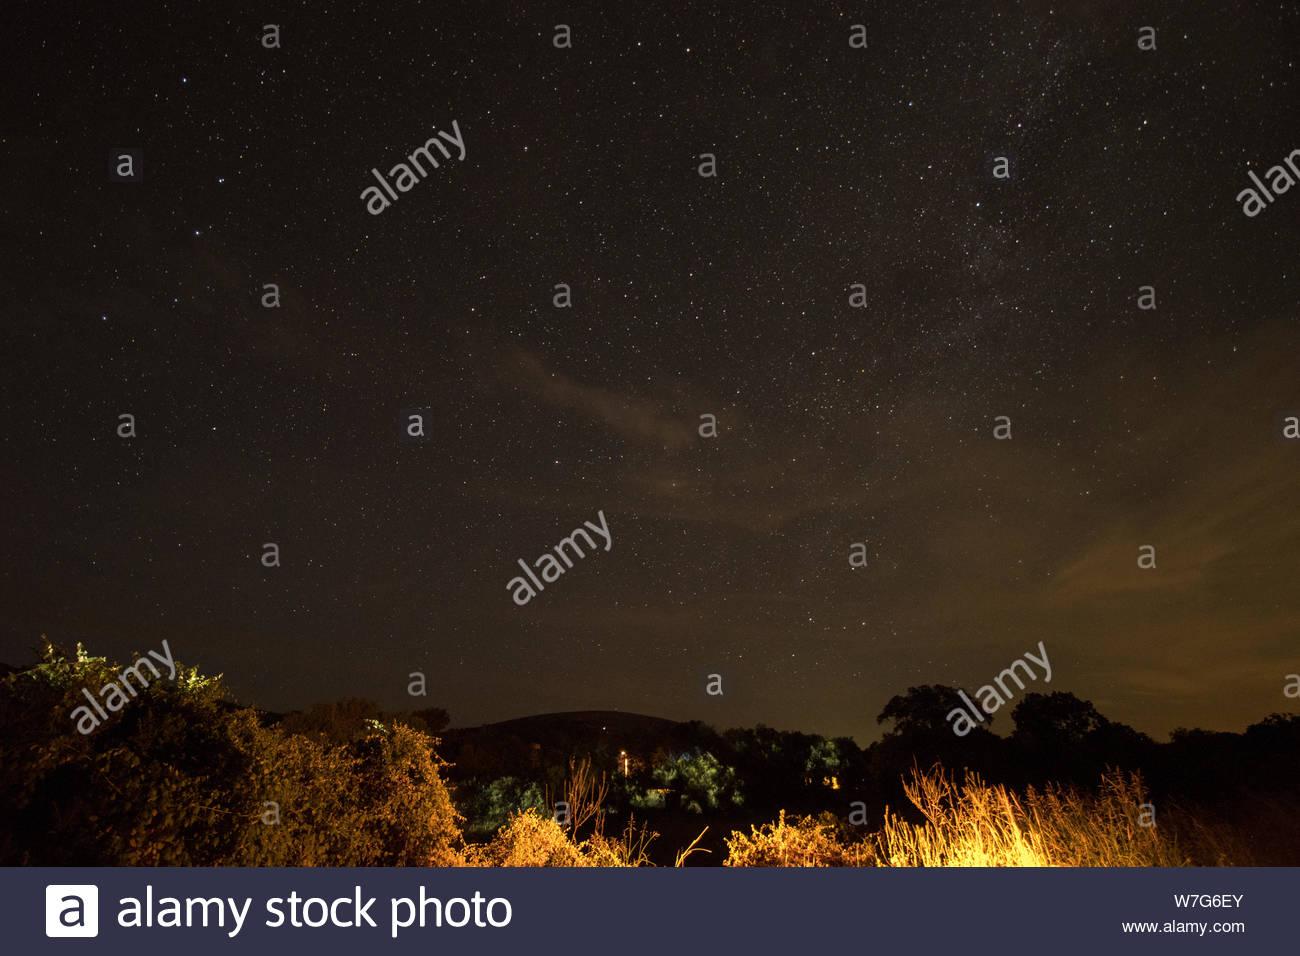 Draco Constellation Stock Photos & Draco Constellation Stock